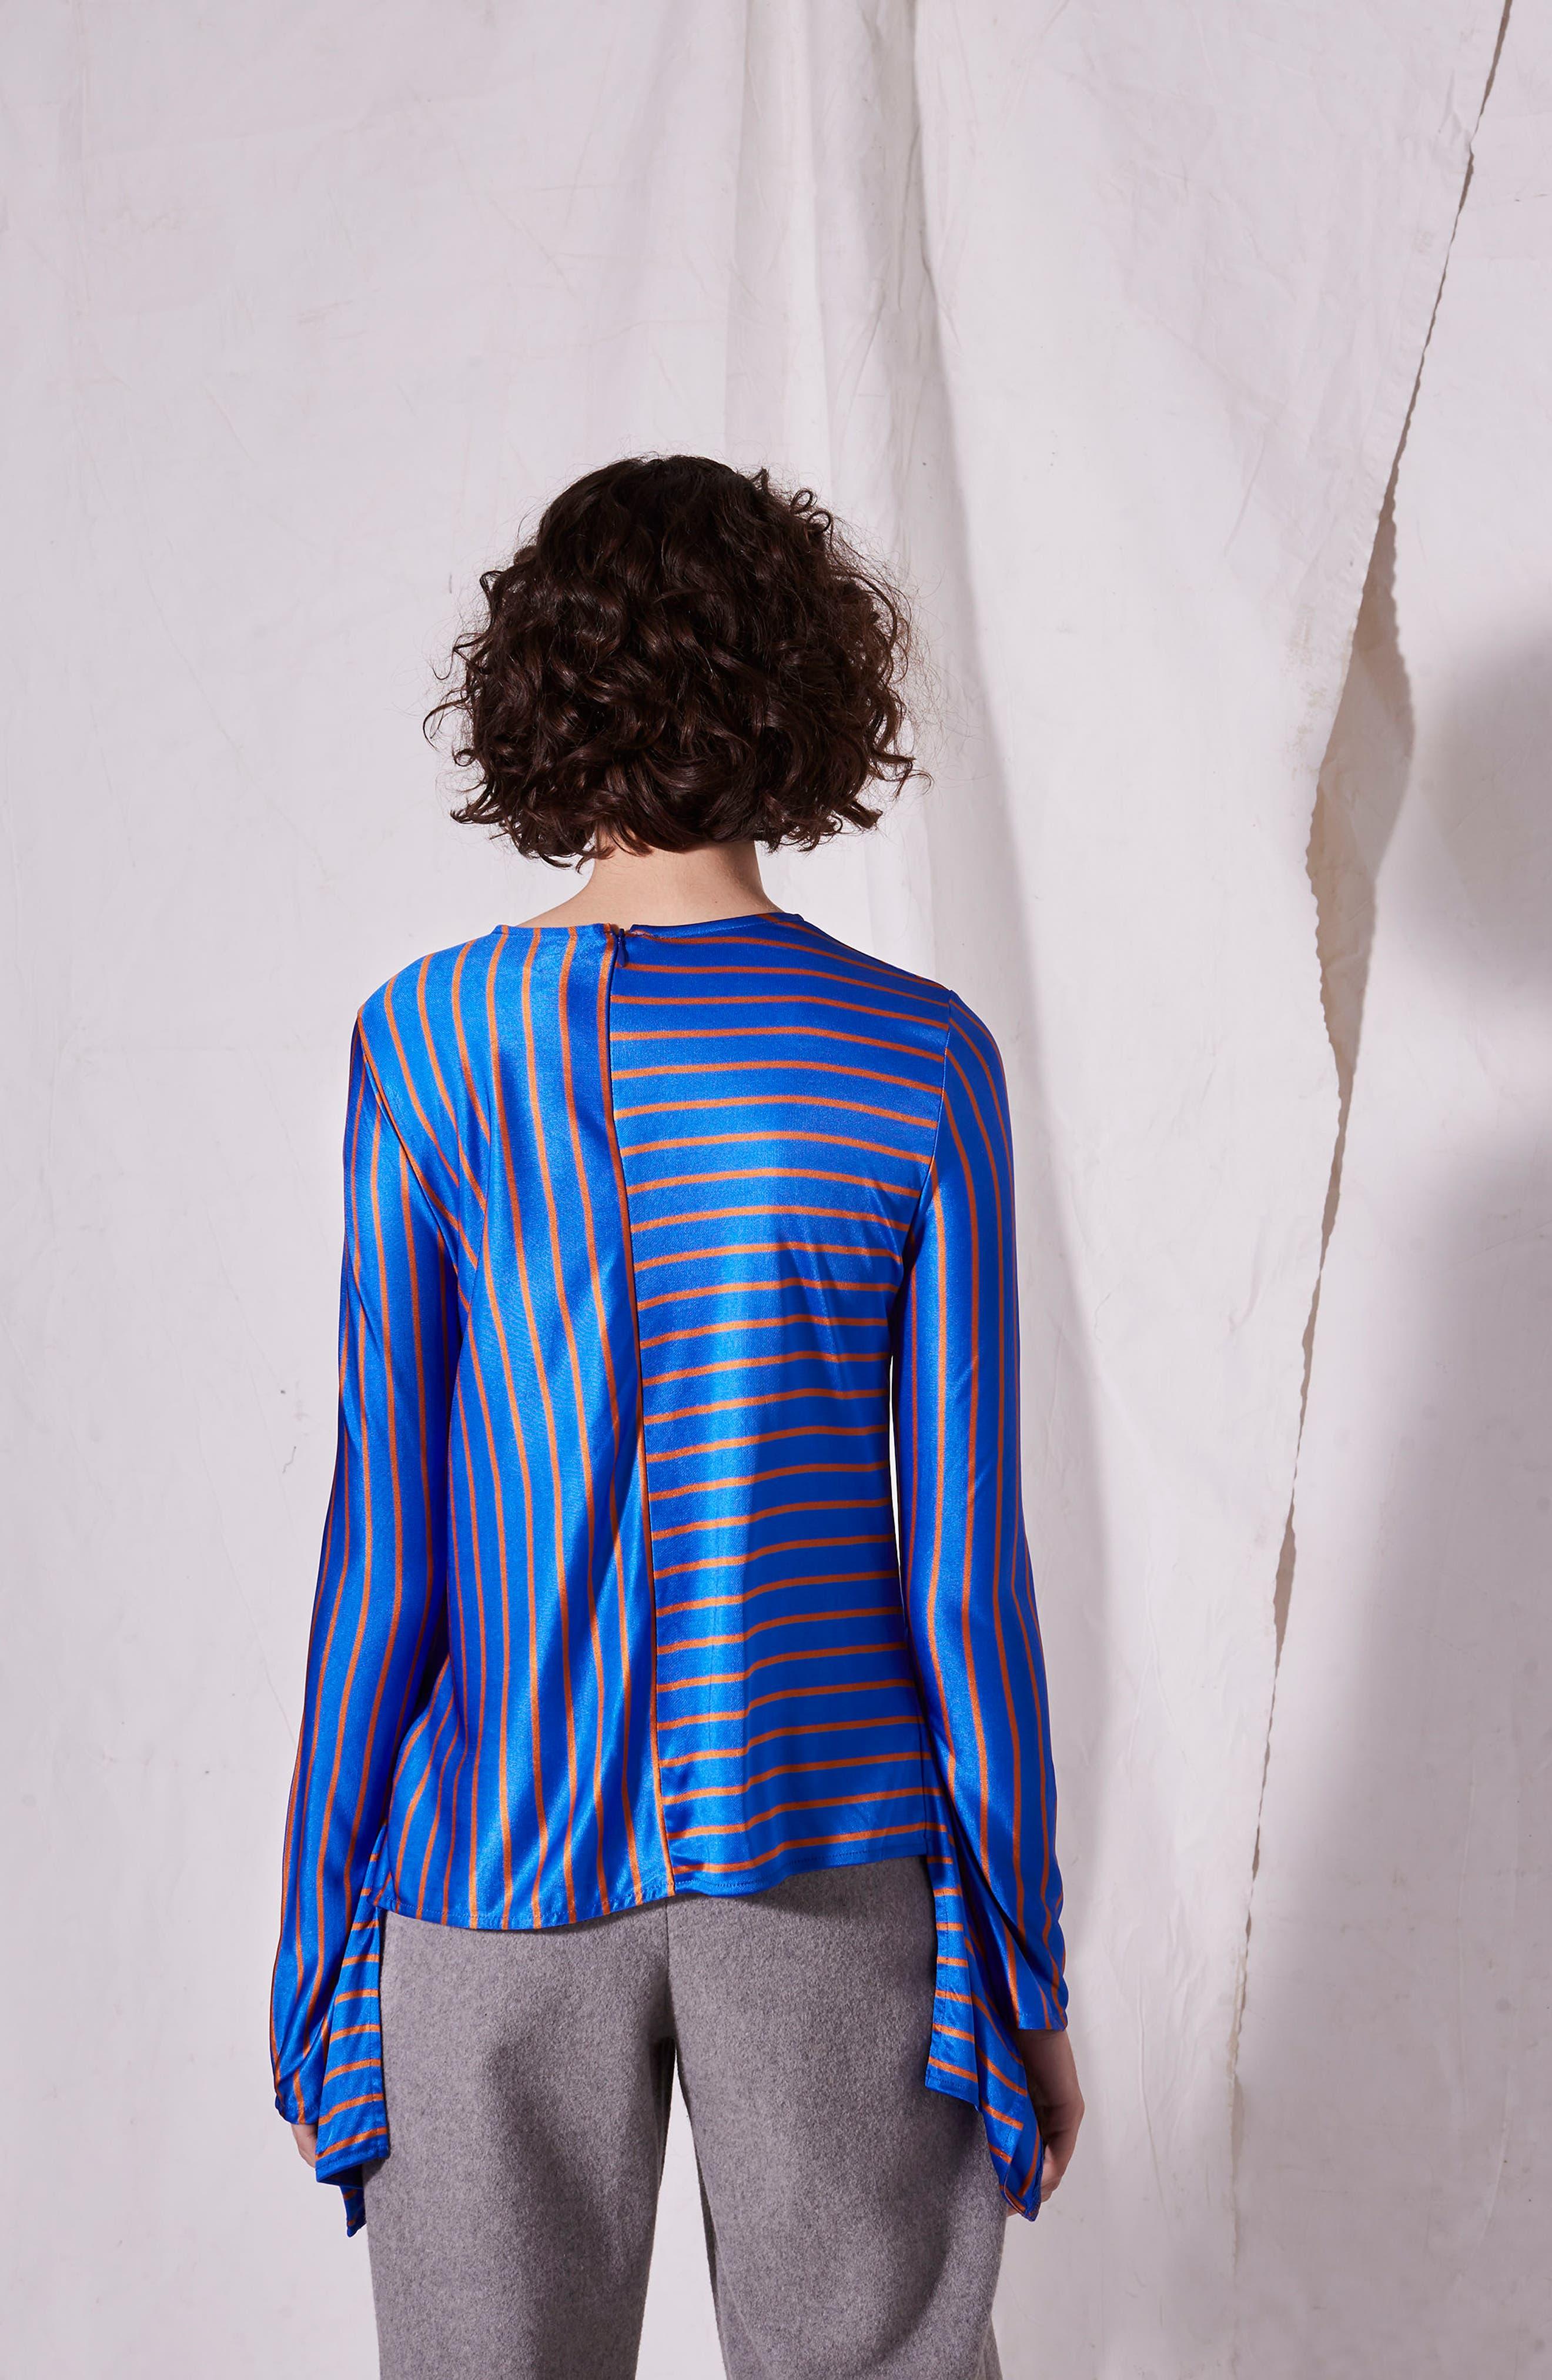 Cutabout Stripe Top,                             Alternate thumbnail 3, color,                             Blue Multi